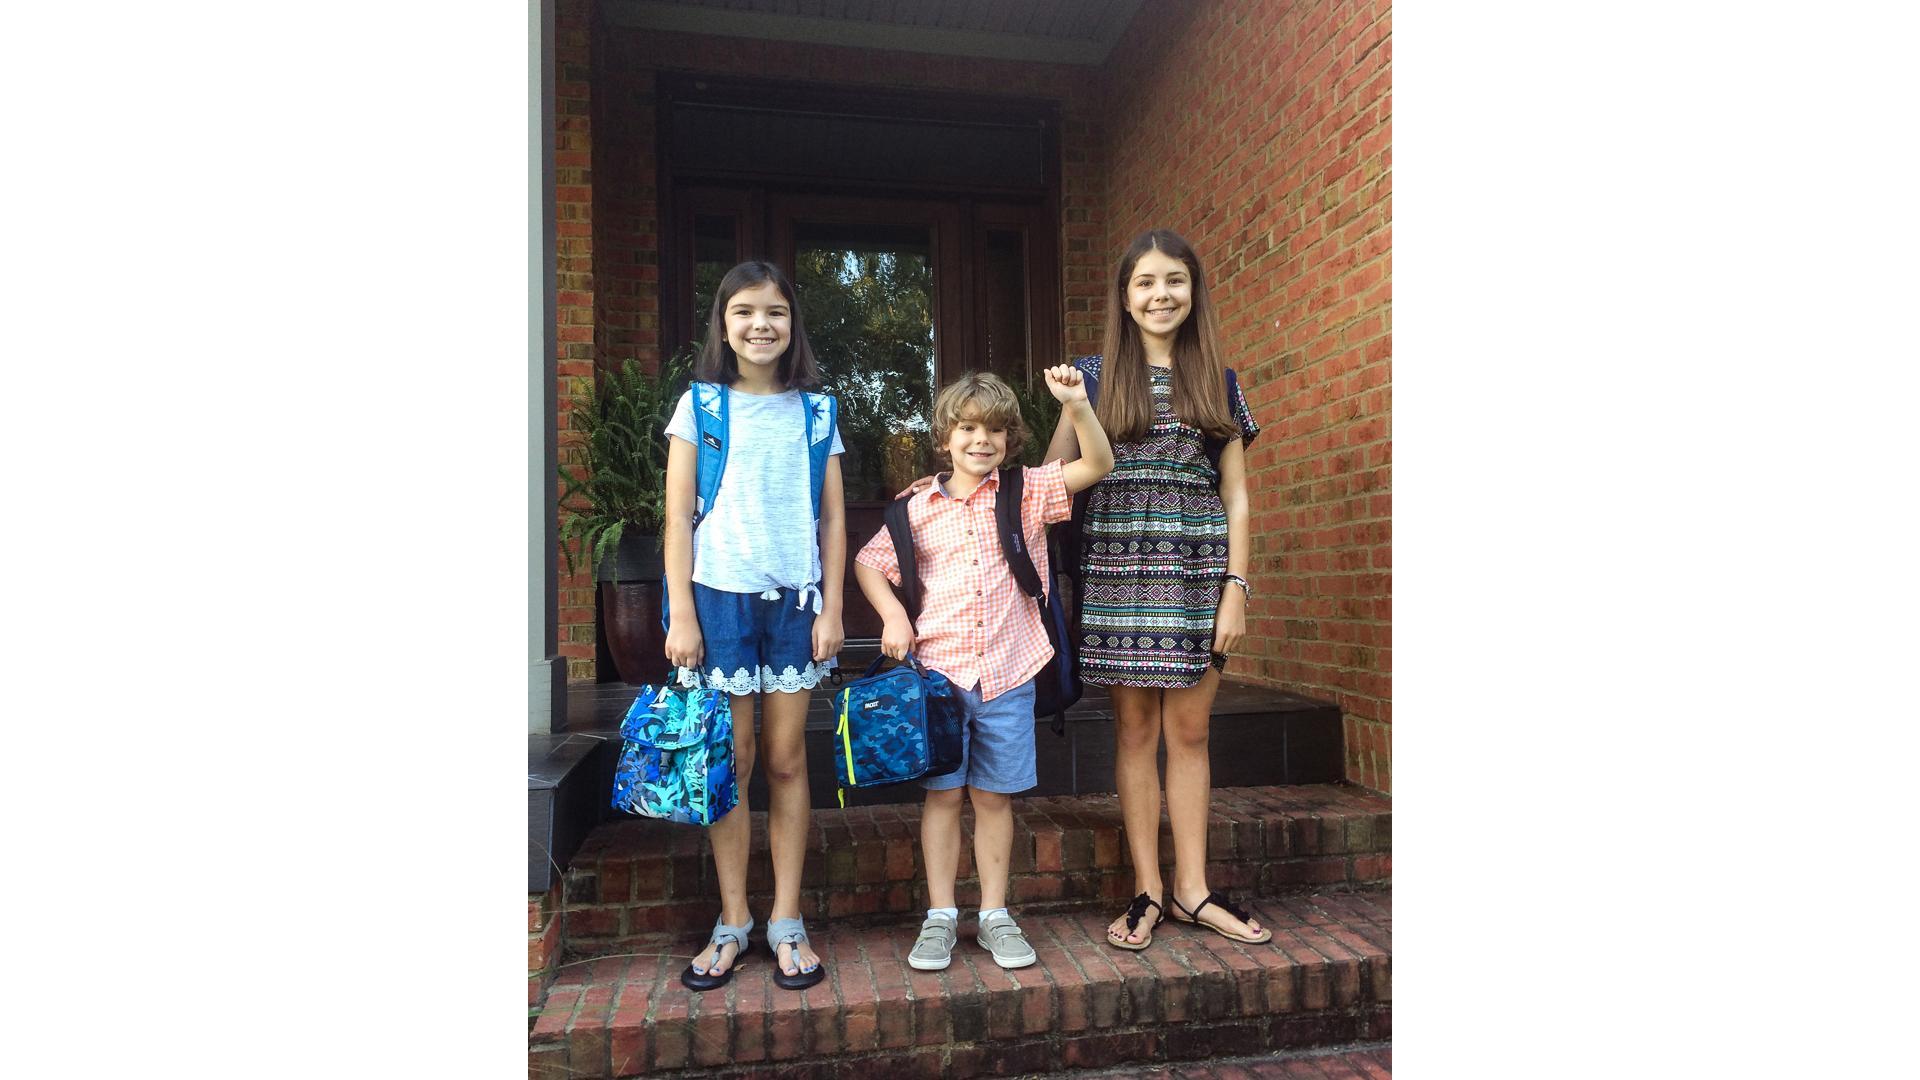 Cameron Huddleston children at their home